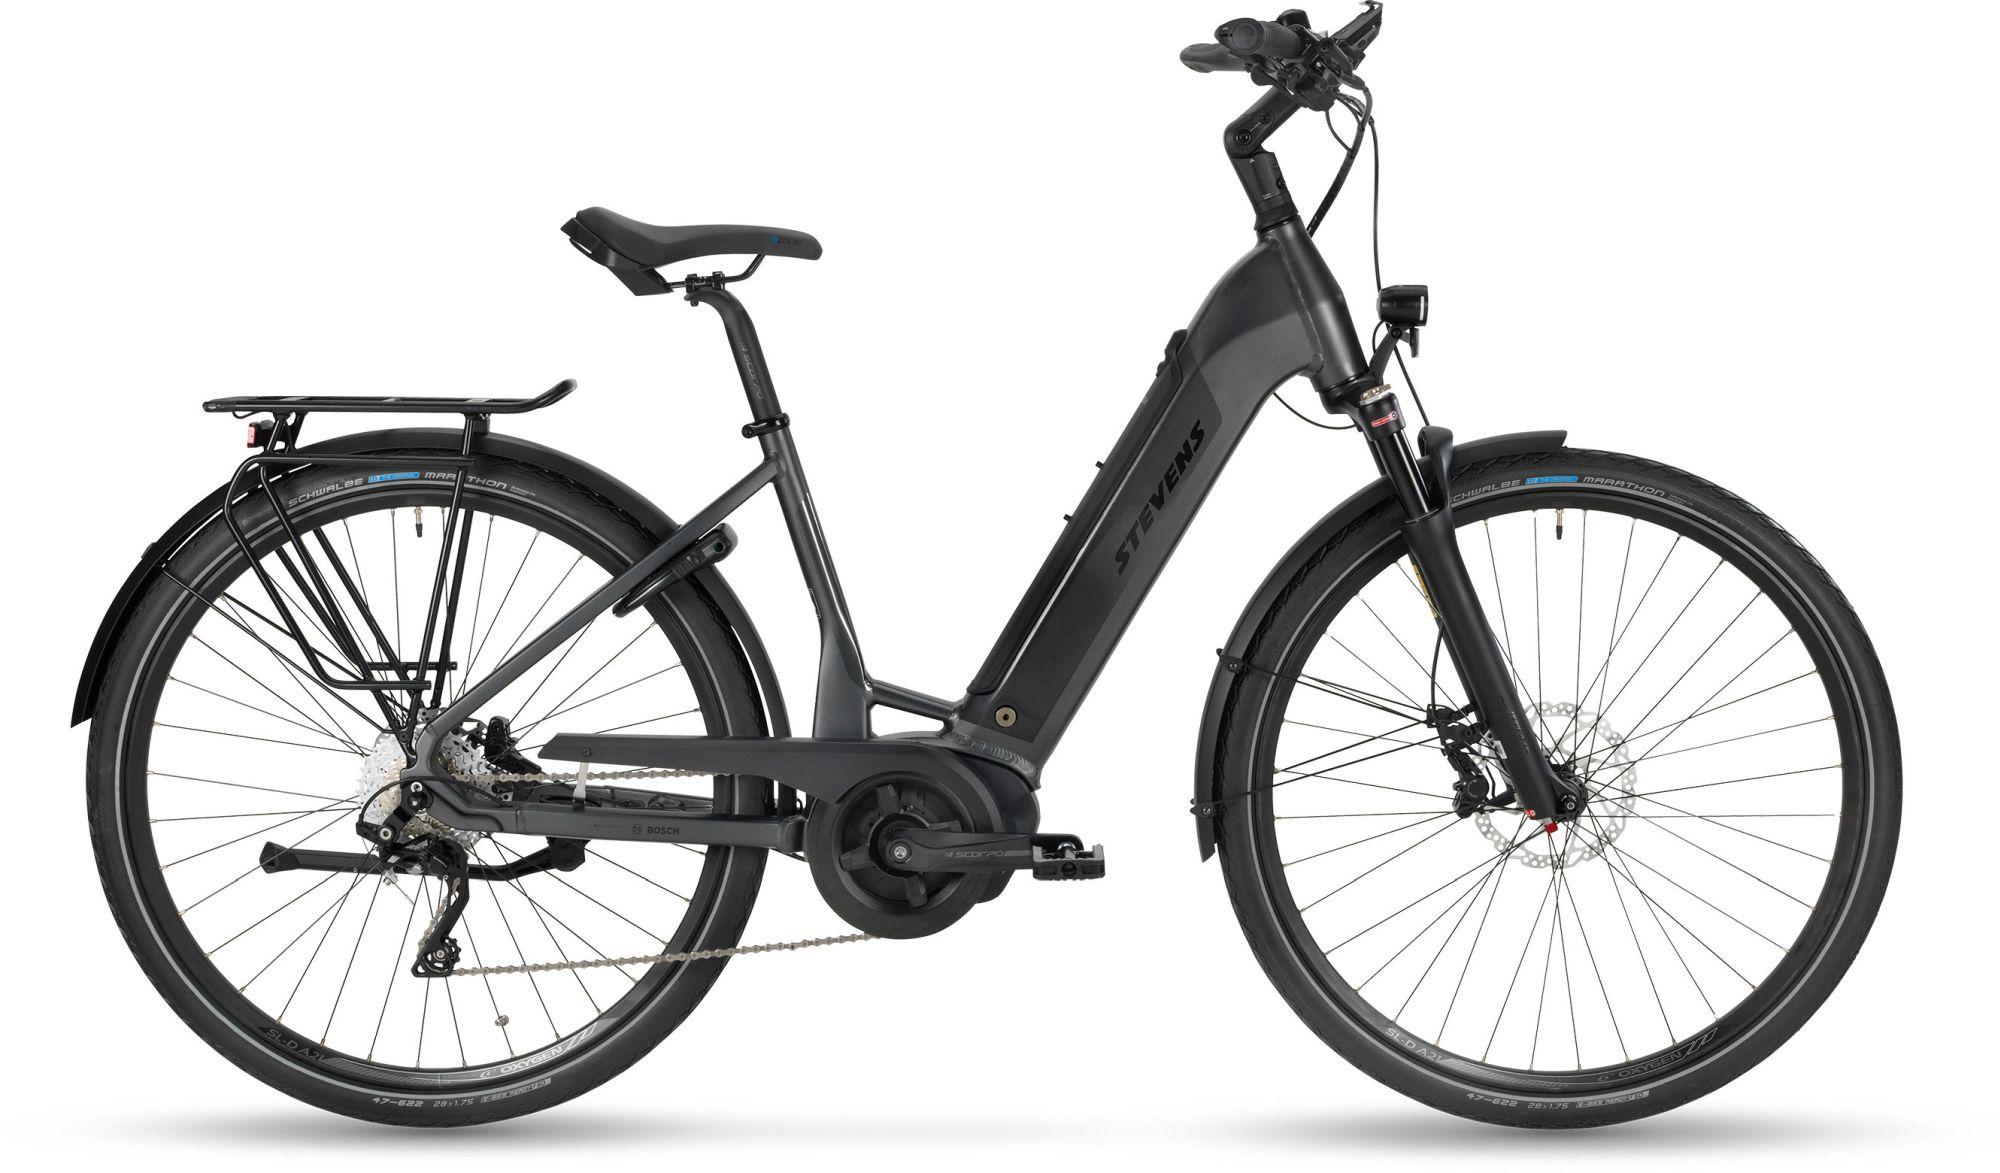 E-Bikes: STEVENS  E-TRITON PT5 Damenfahrrad Wave Modell 2020 28 Zoll 56 cm